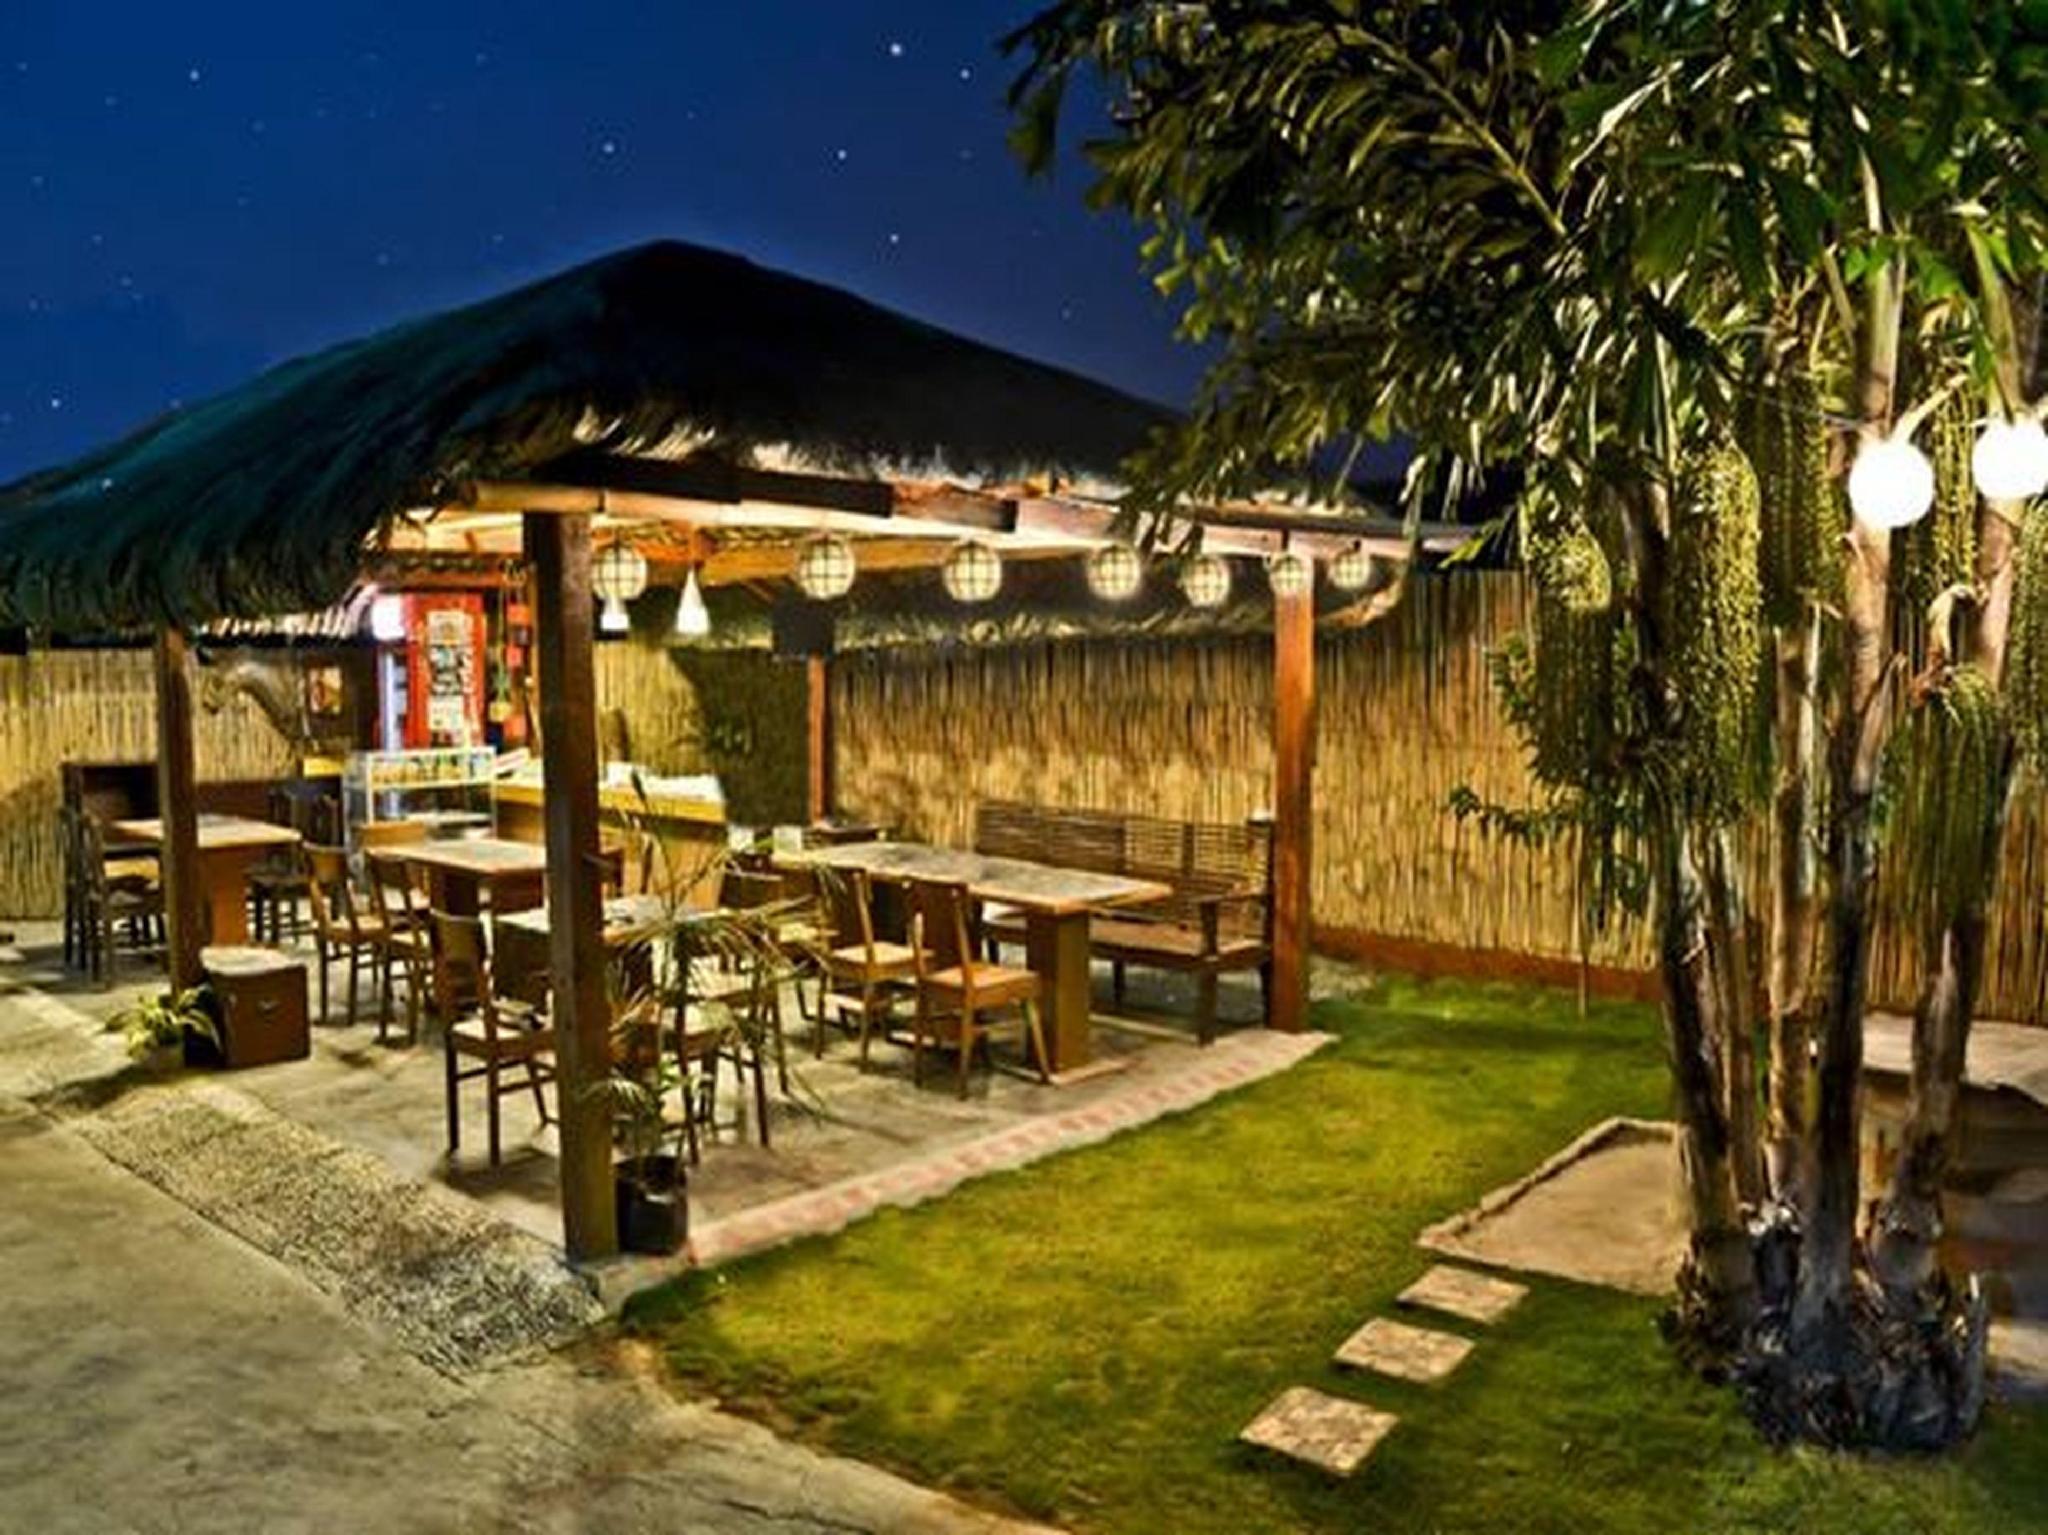 AA Travellers Pad Hotel, Laoag City